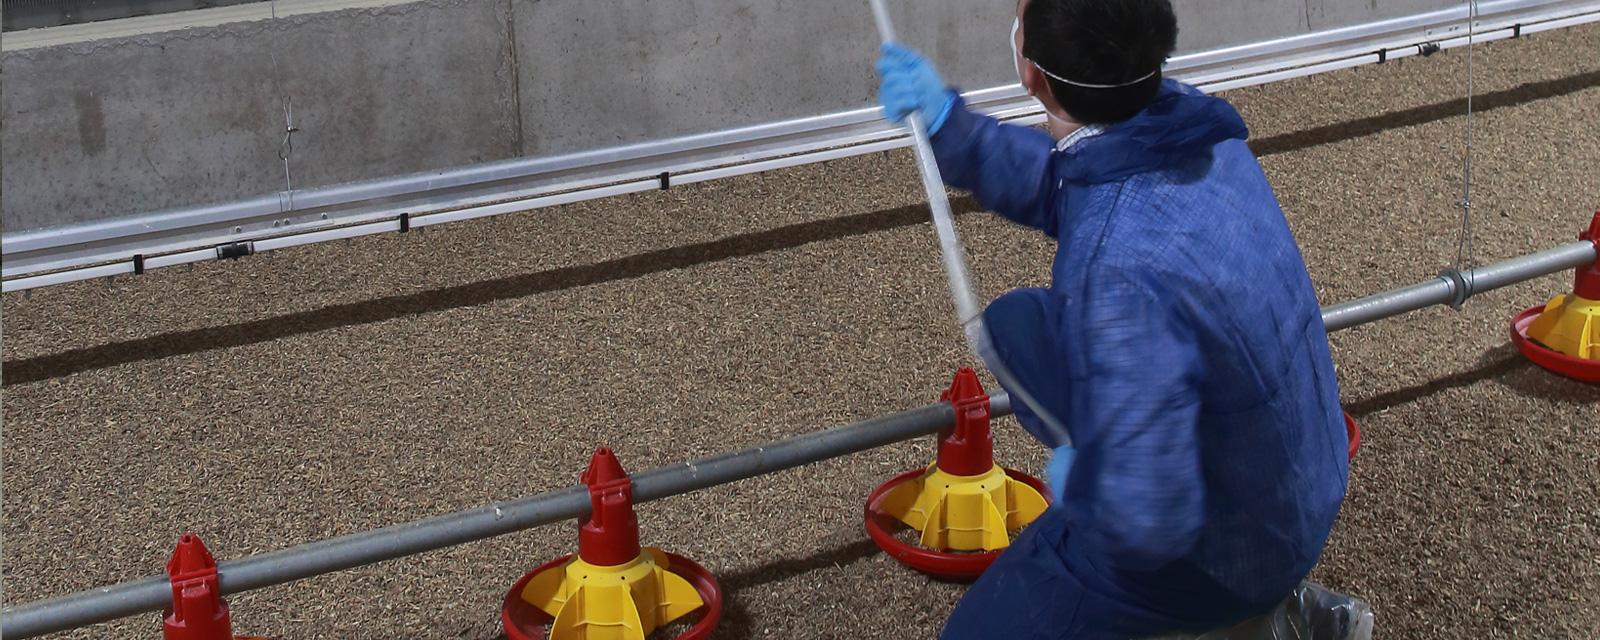 Rosehill Poultry   Disease Surveillance